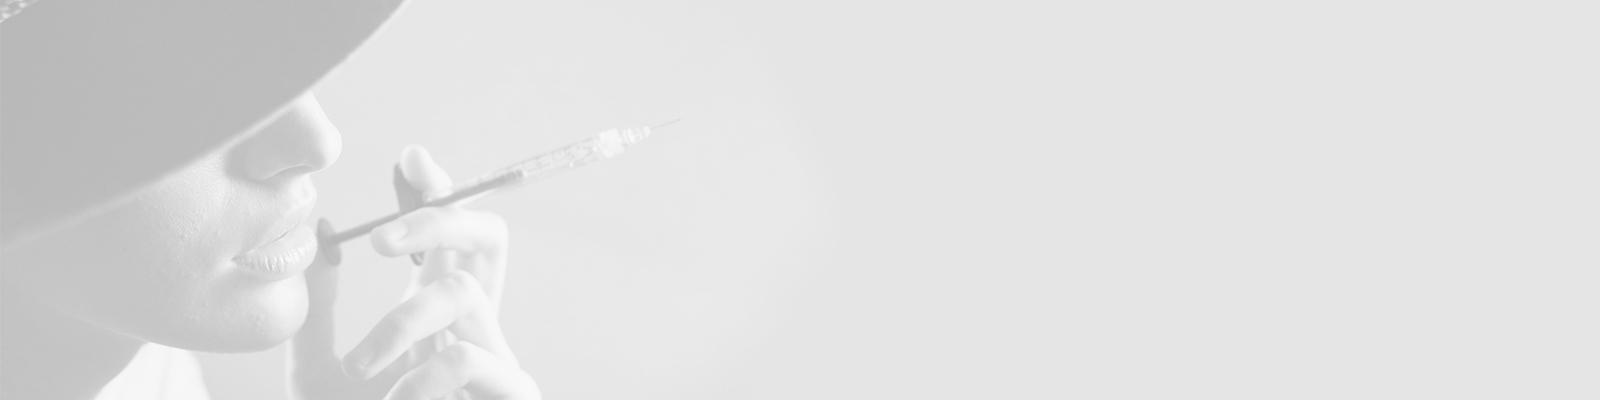 CosmeDocs Banner